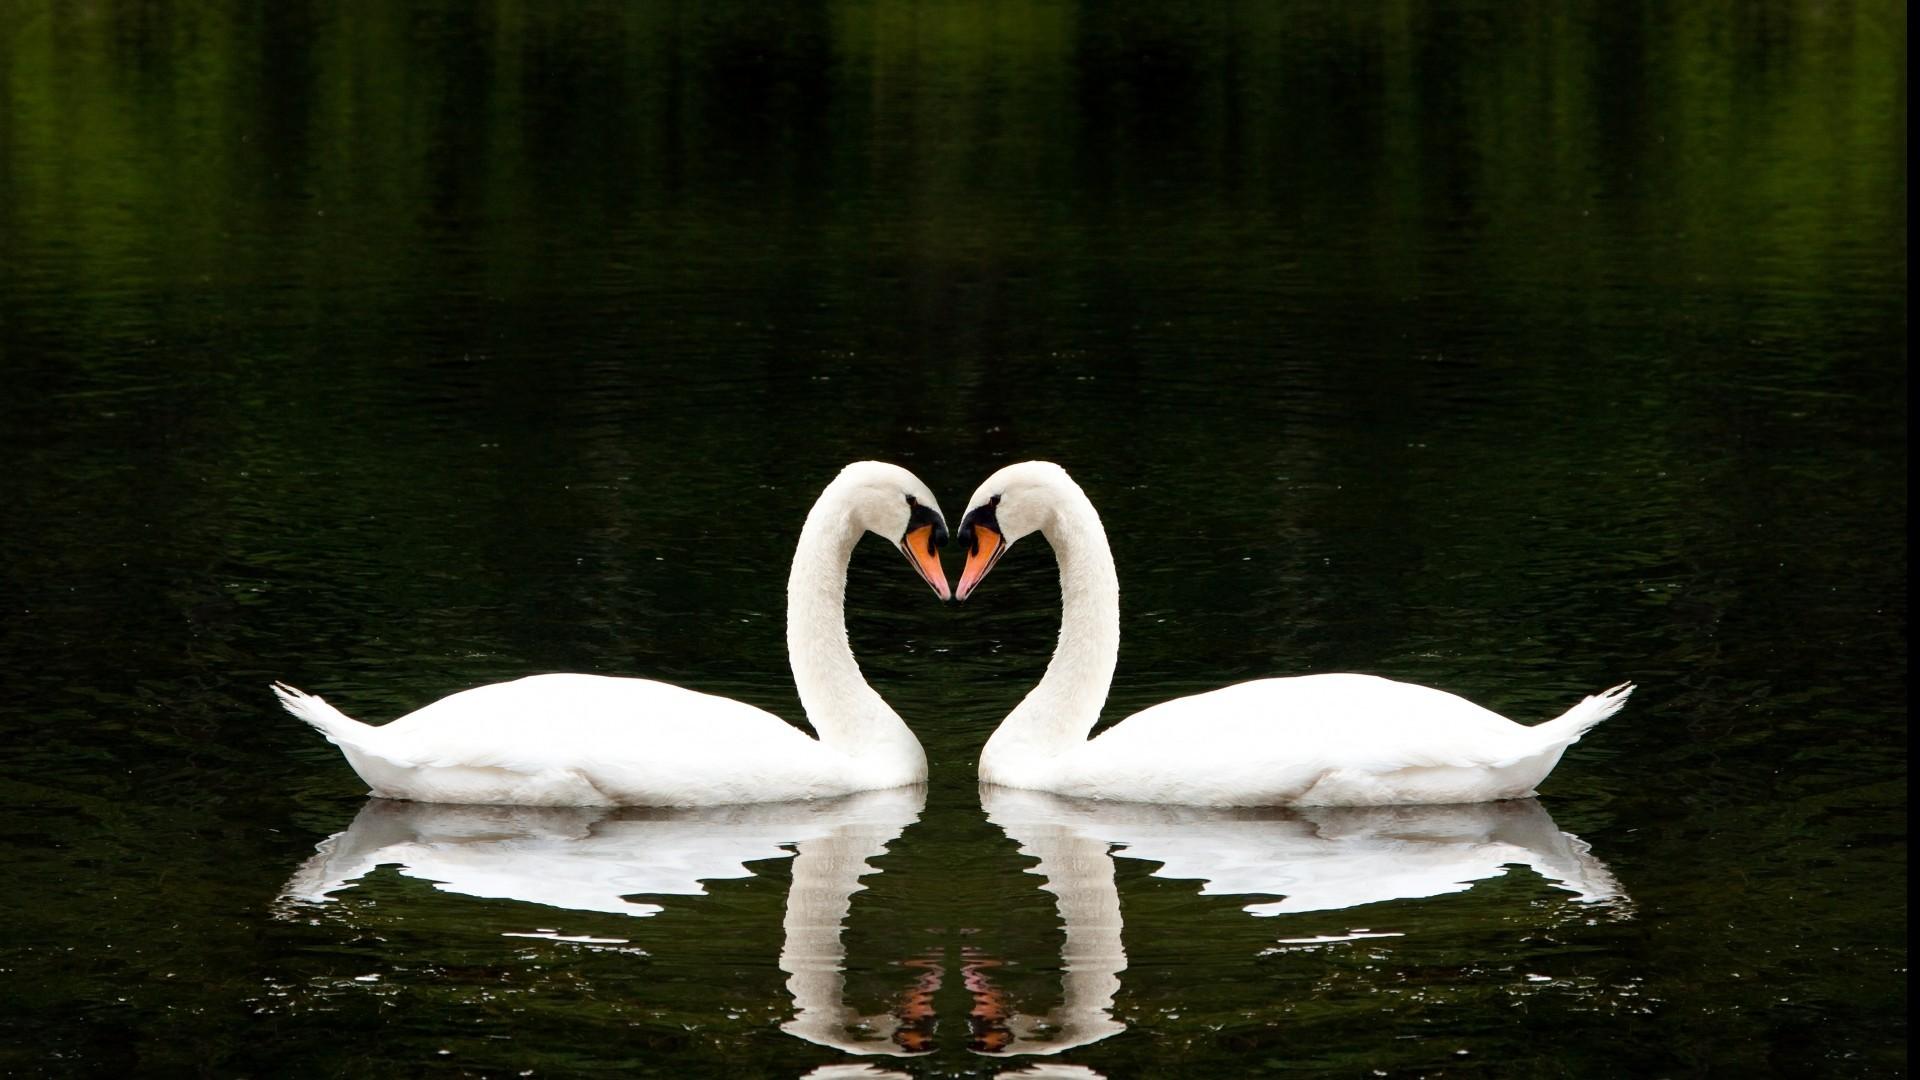 Swan hd wallpaper 1080p for pc